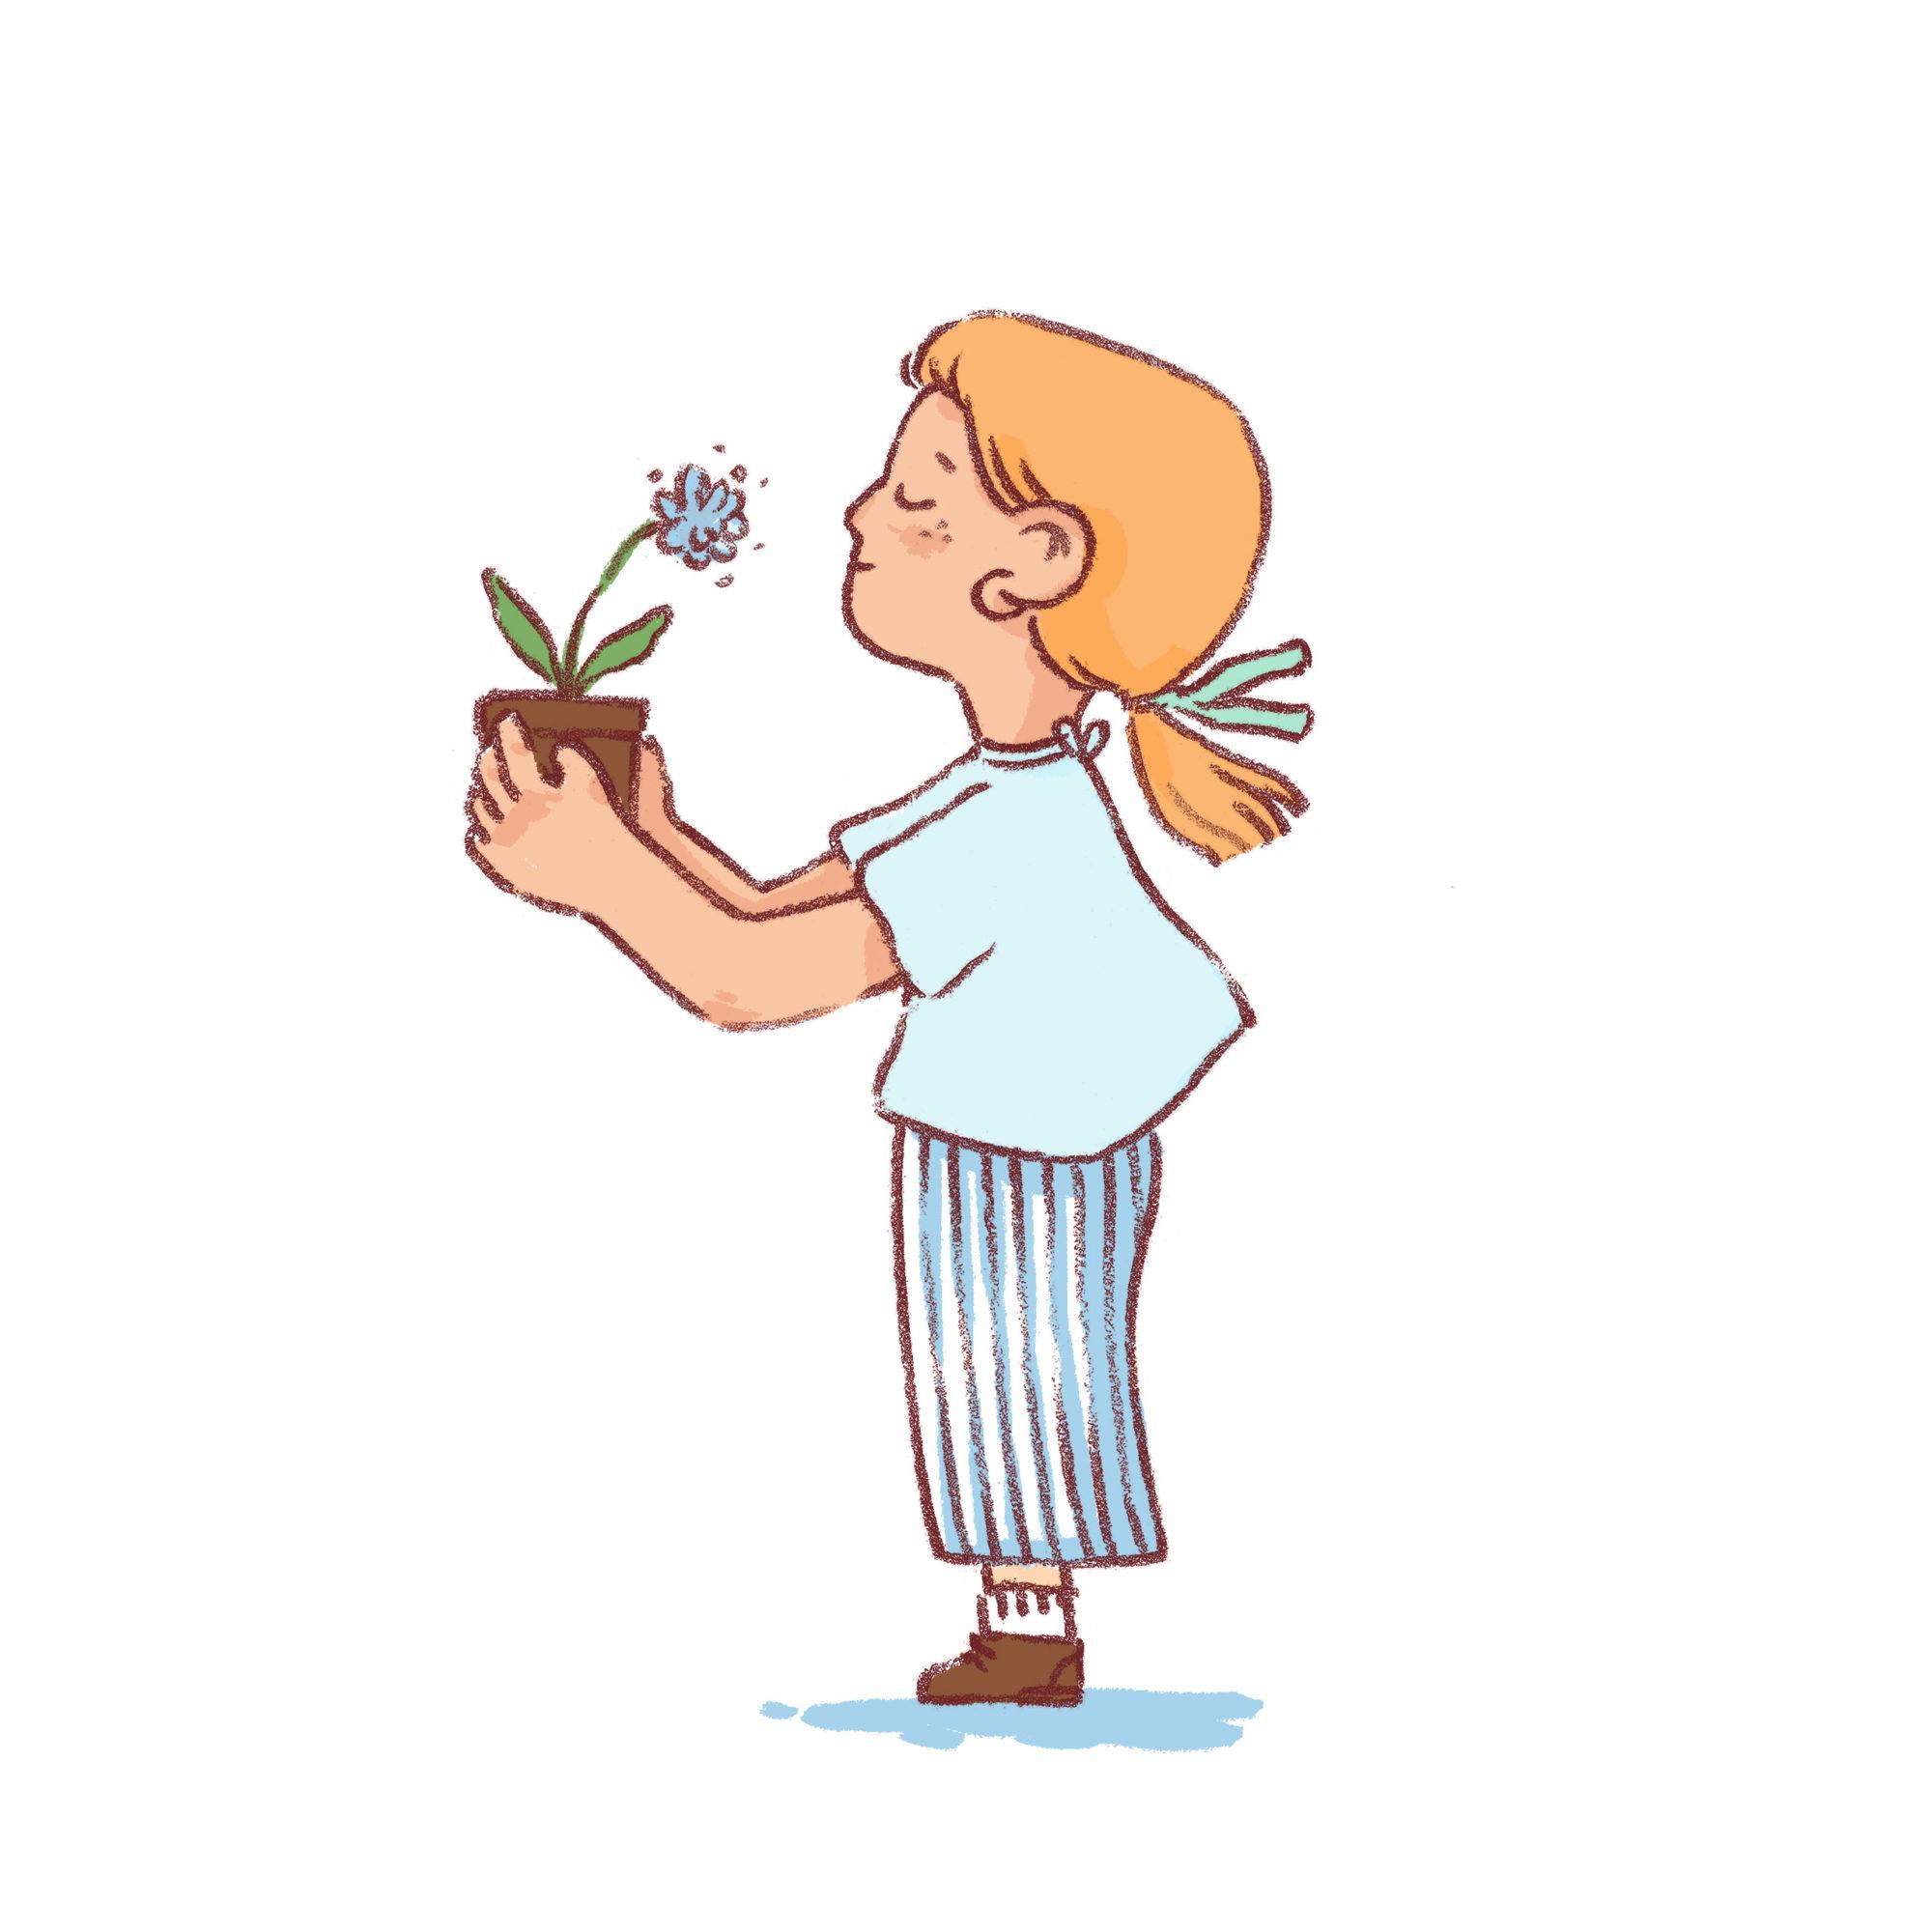 Petite fleur, 2020.